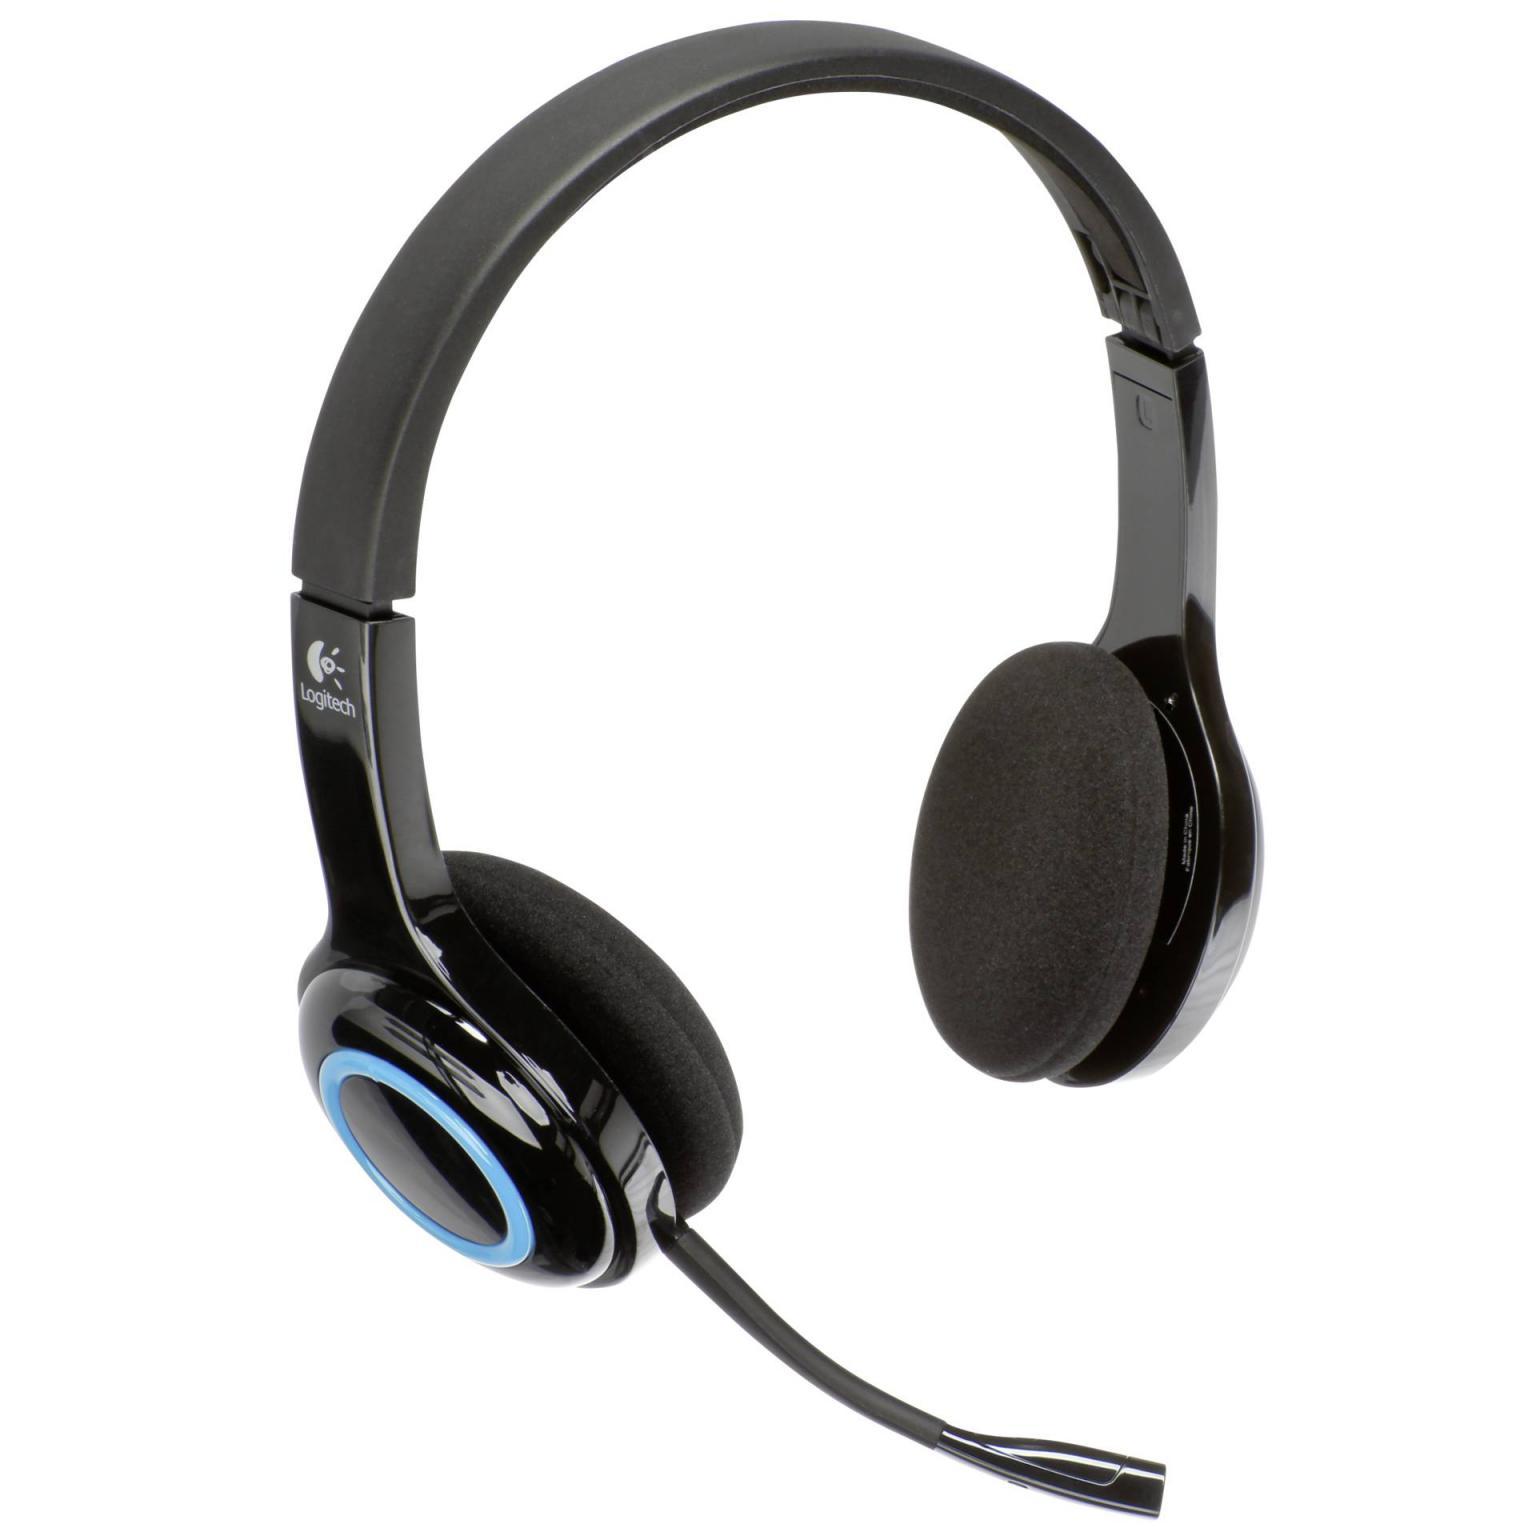 Logitech Logitech H 600 Cordless Headset USB